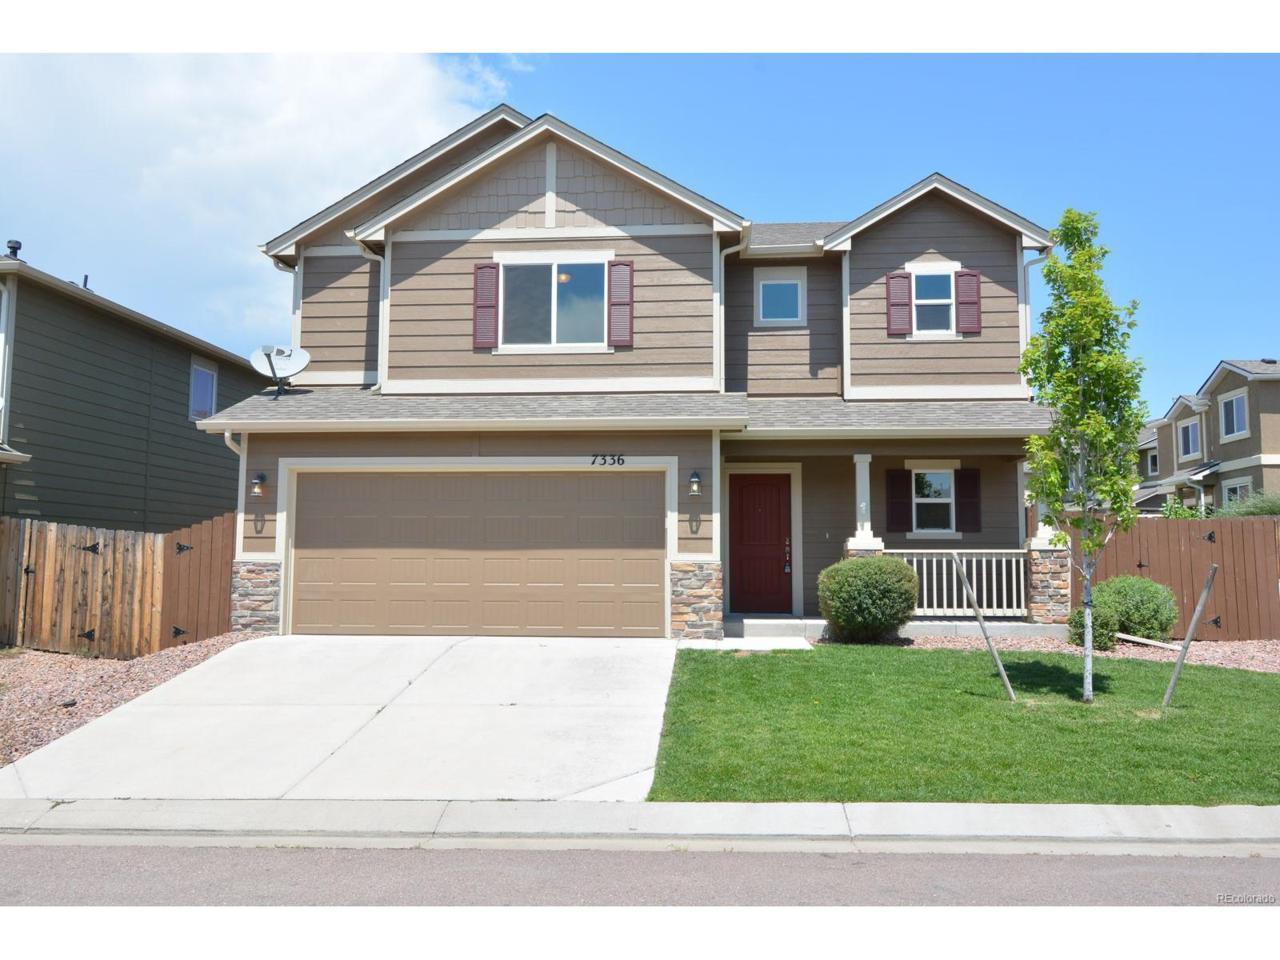 7336 Axis Point, Colorado Springs, CO 80922 (MLS #6550197) :: 8z Real Estate